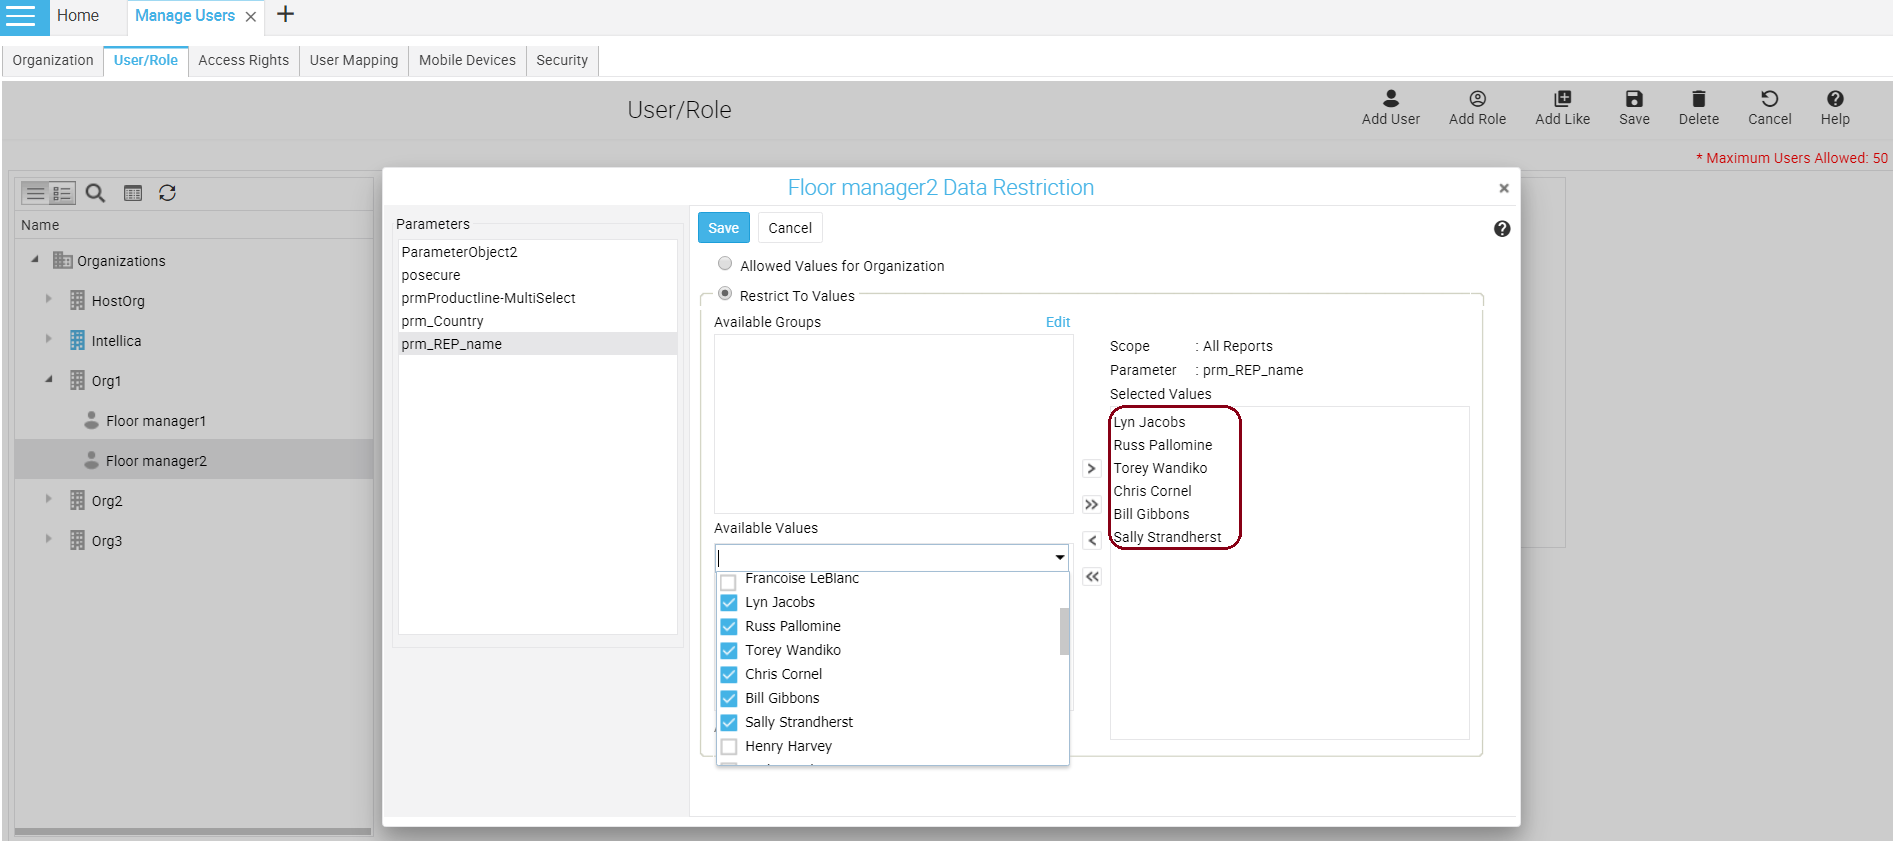 Data Restriction for 'Floor manager2'